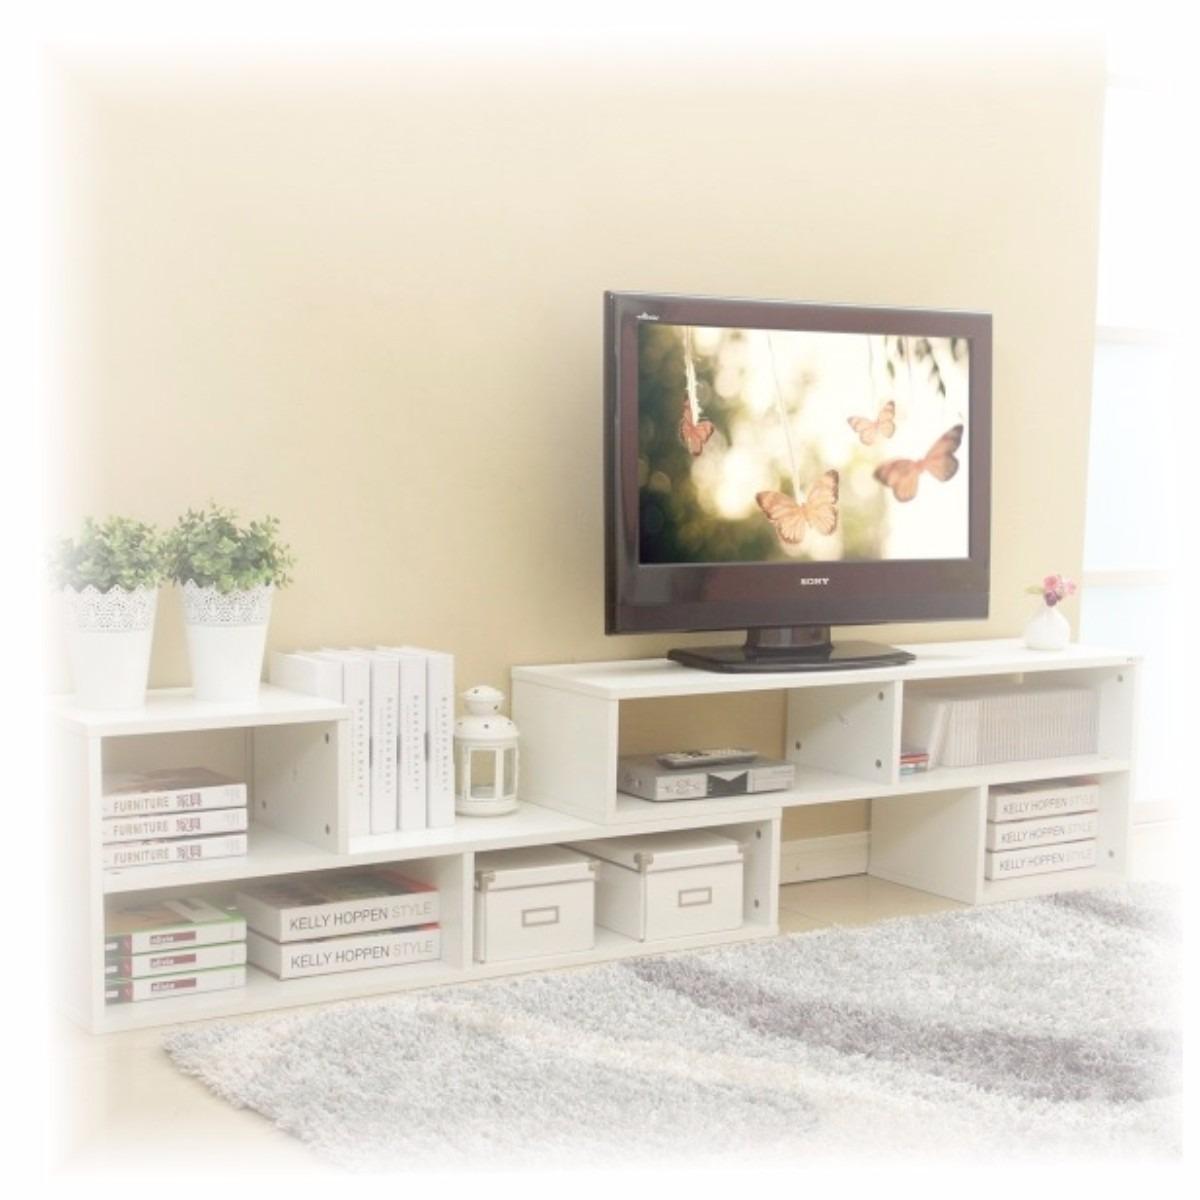 Mueble modular rack tv hasta mts multimueble living for Mueble modular